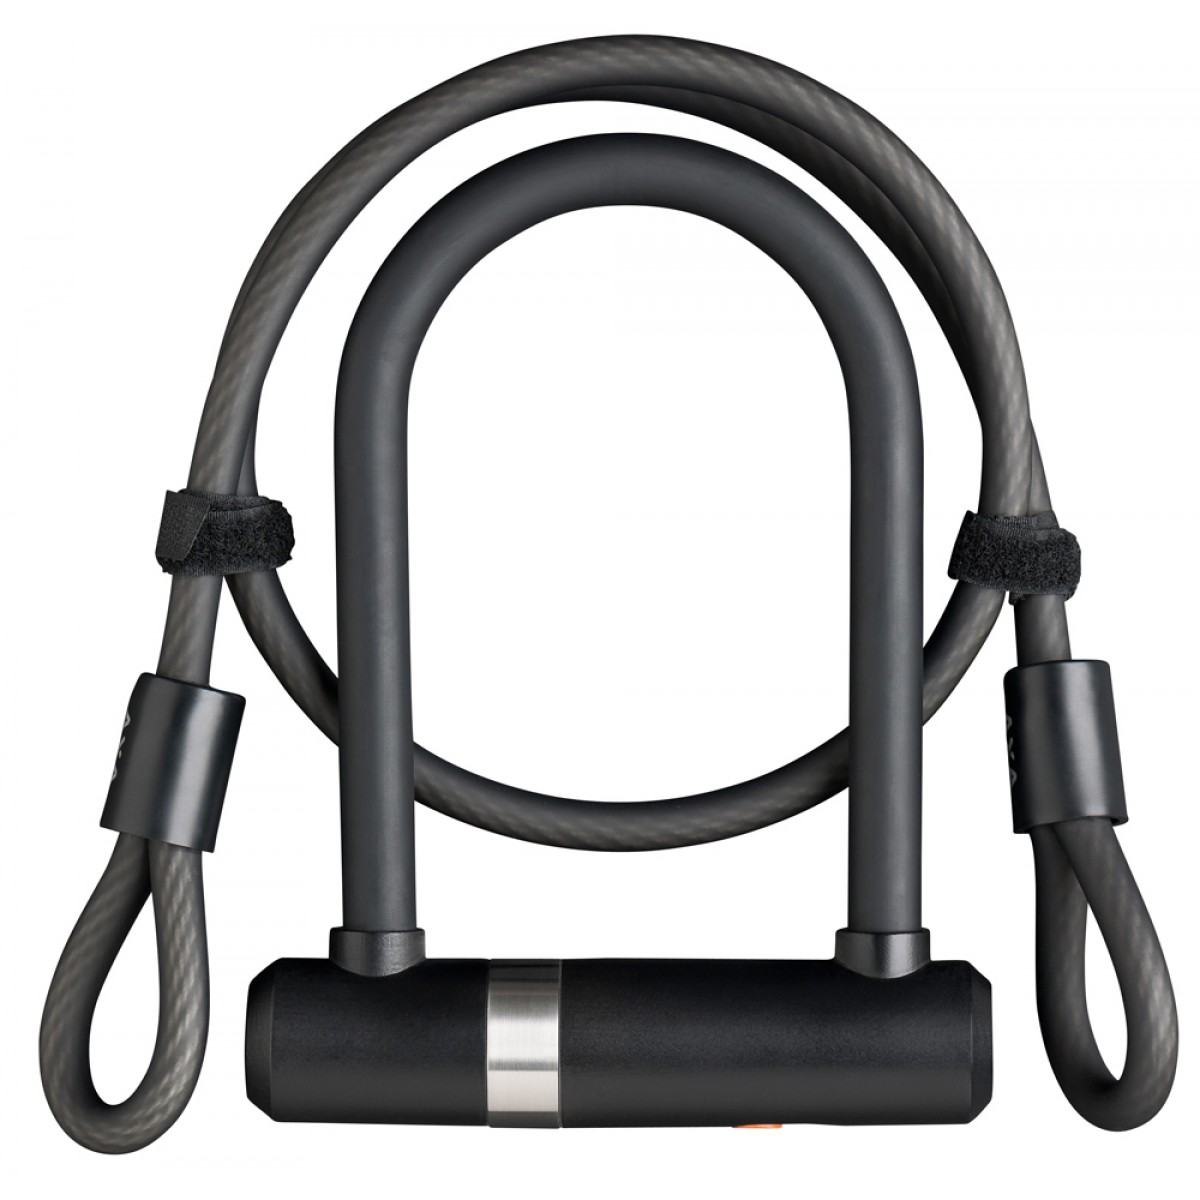 axa newton pro mini 140 16 u lock with cable silver sold secure. Black Bedroom Furniture Sets. Home Design Ideas